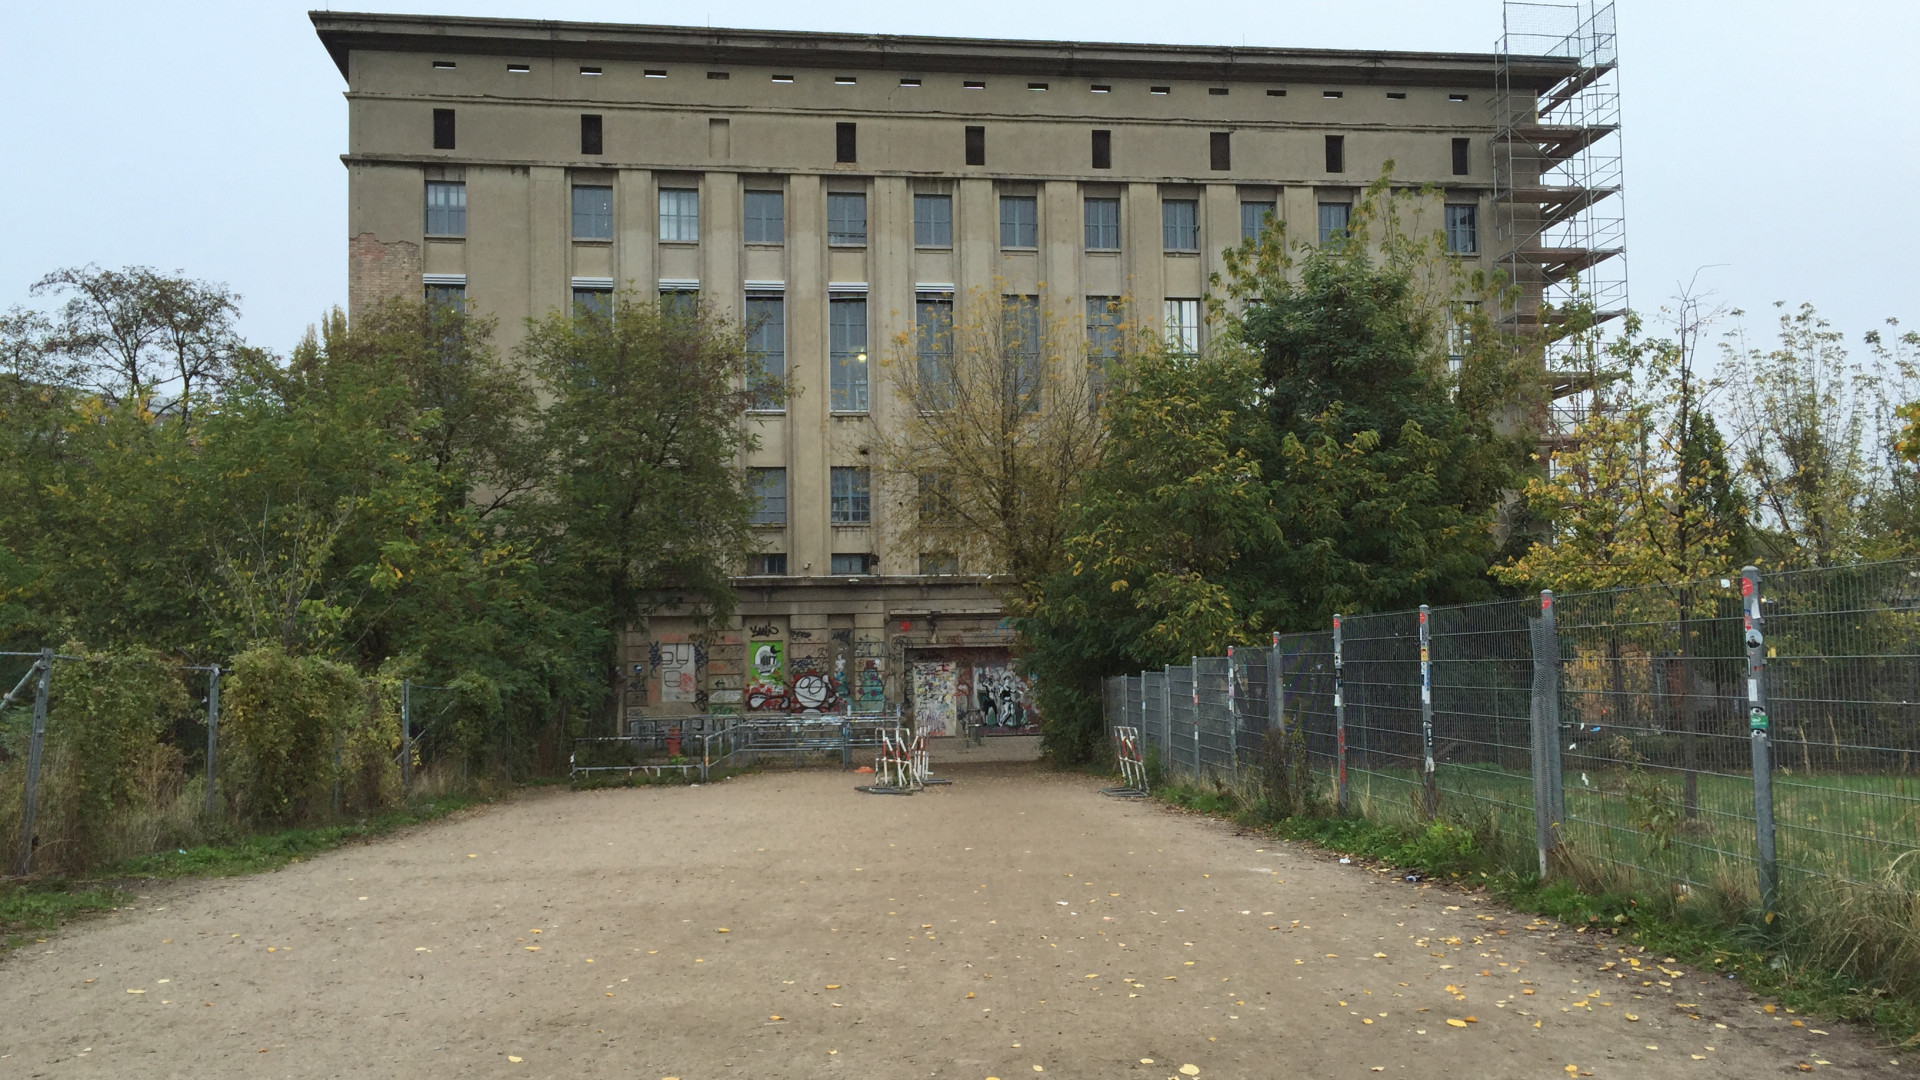 Exterior of Berghain club in Berlin